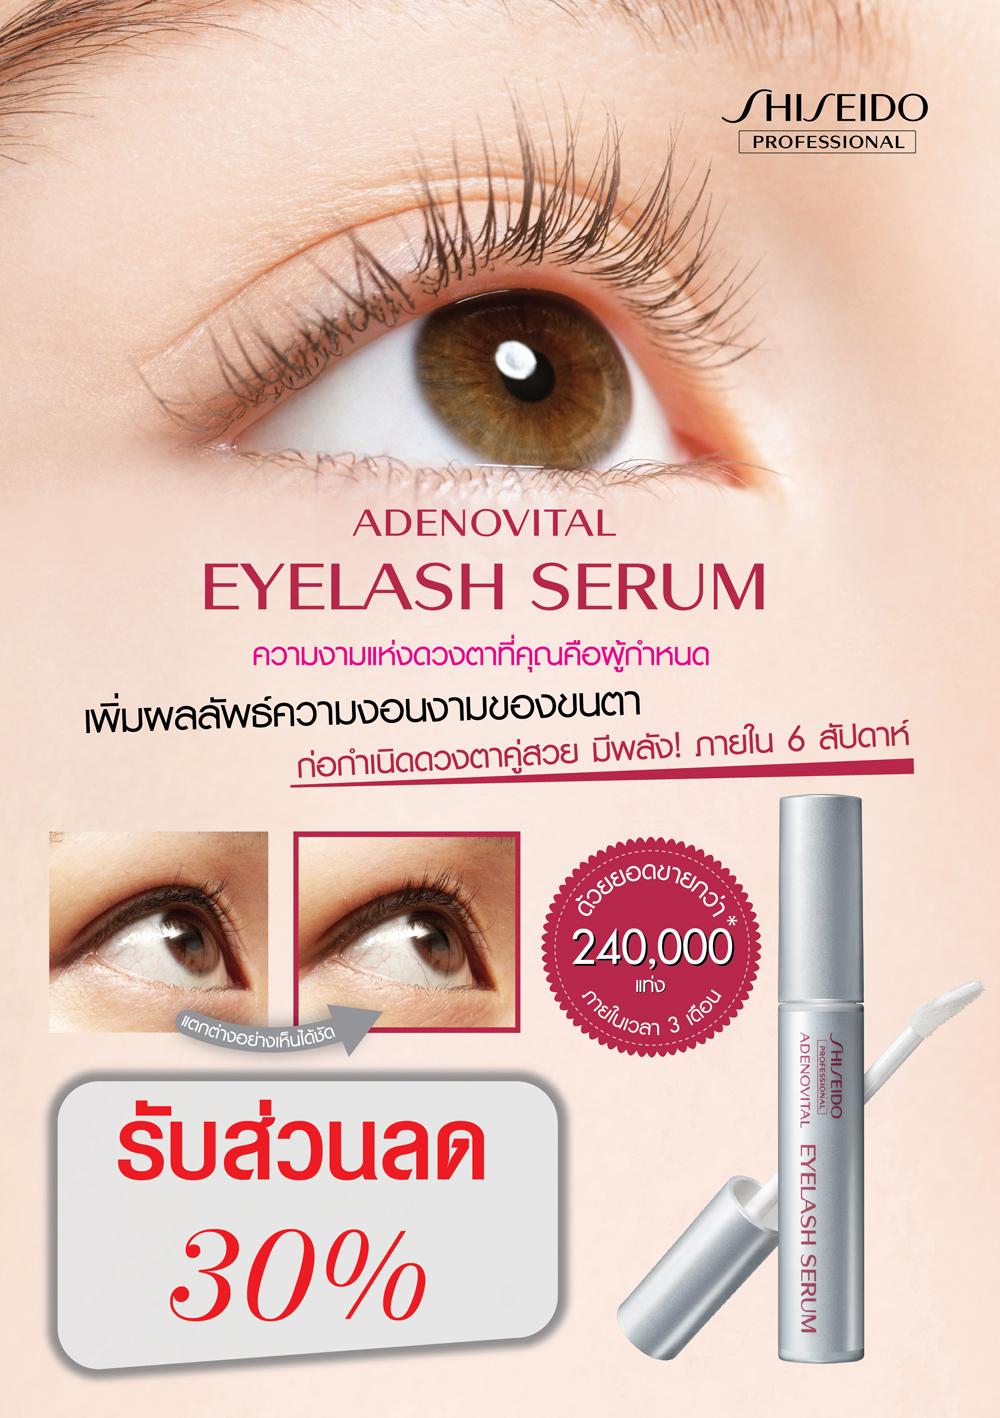 10a9fa856a4 Shiseido Adenovital Eyelash Serum - Page 4 - Daftar Update Harga ...